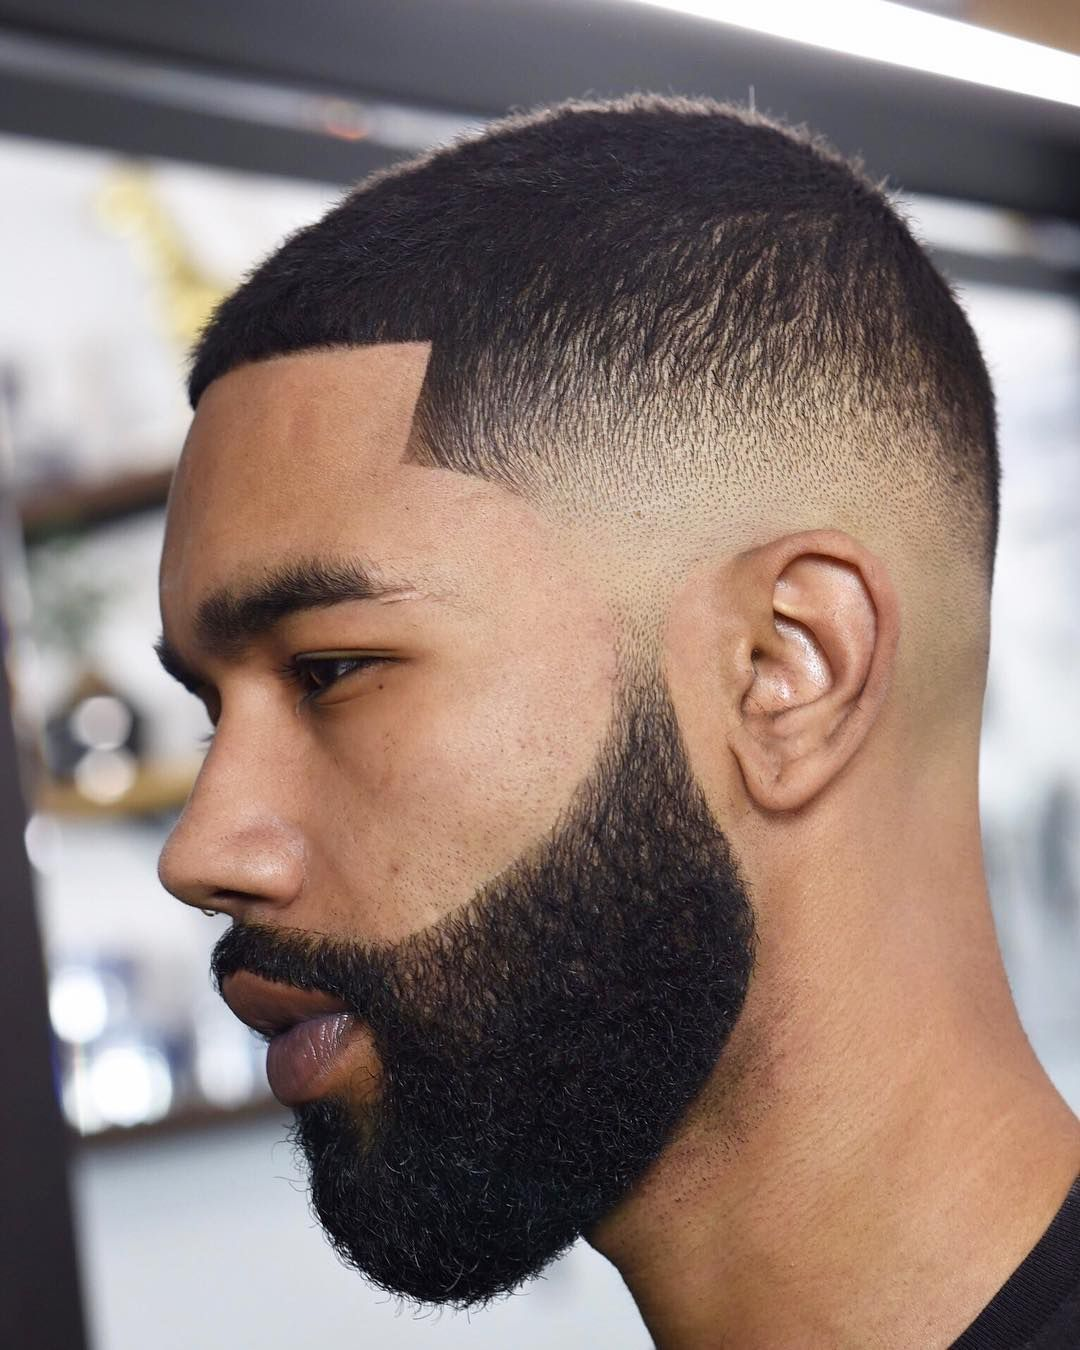 37 New Style Haircut For Men 2019 Mens Haircuts Fade Mid Fade Haircut Medium Fade Haircut